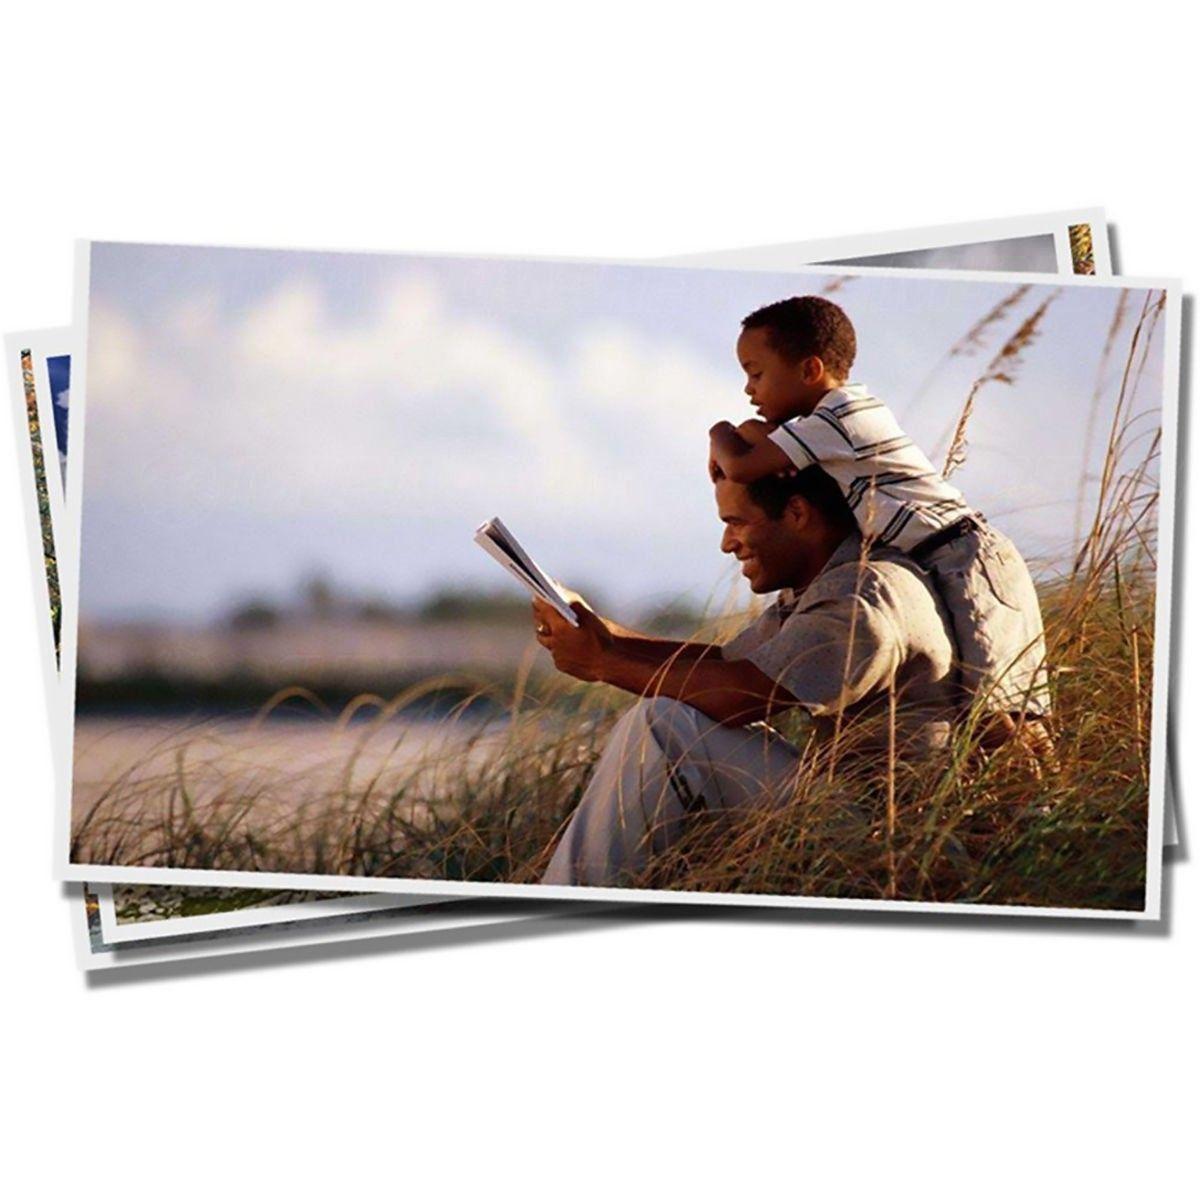 Papel Fotográfico Matte Fosco 108g A4 Branco Resistente à Água / 500 folhas